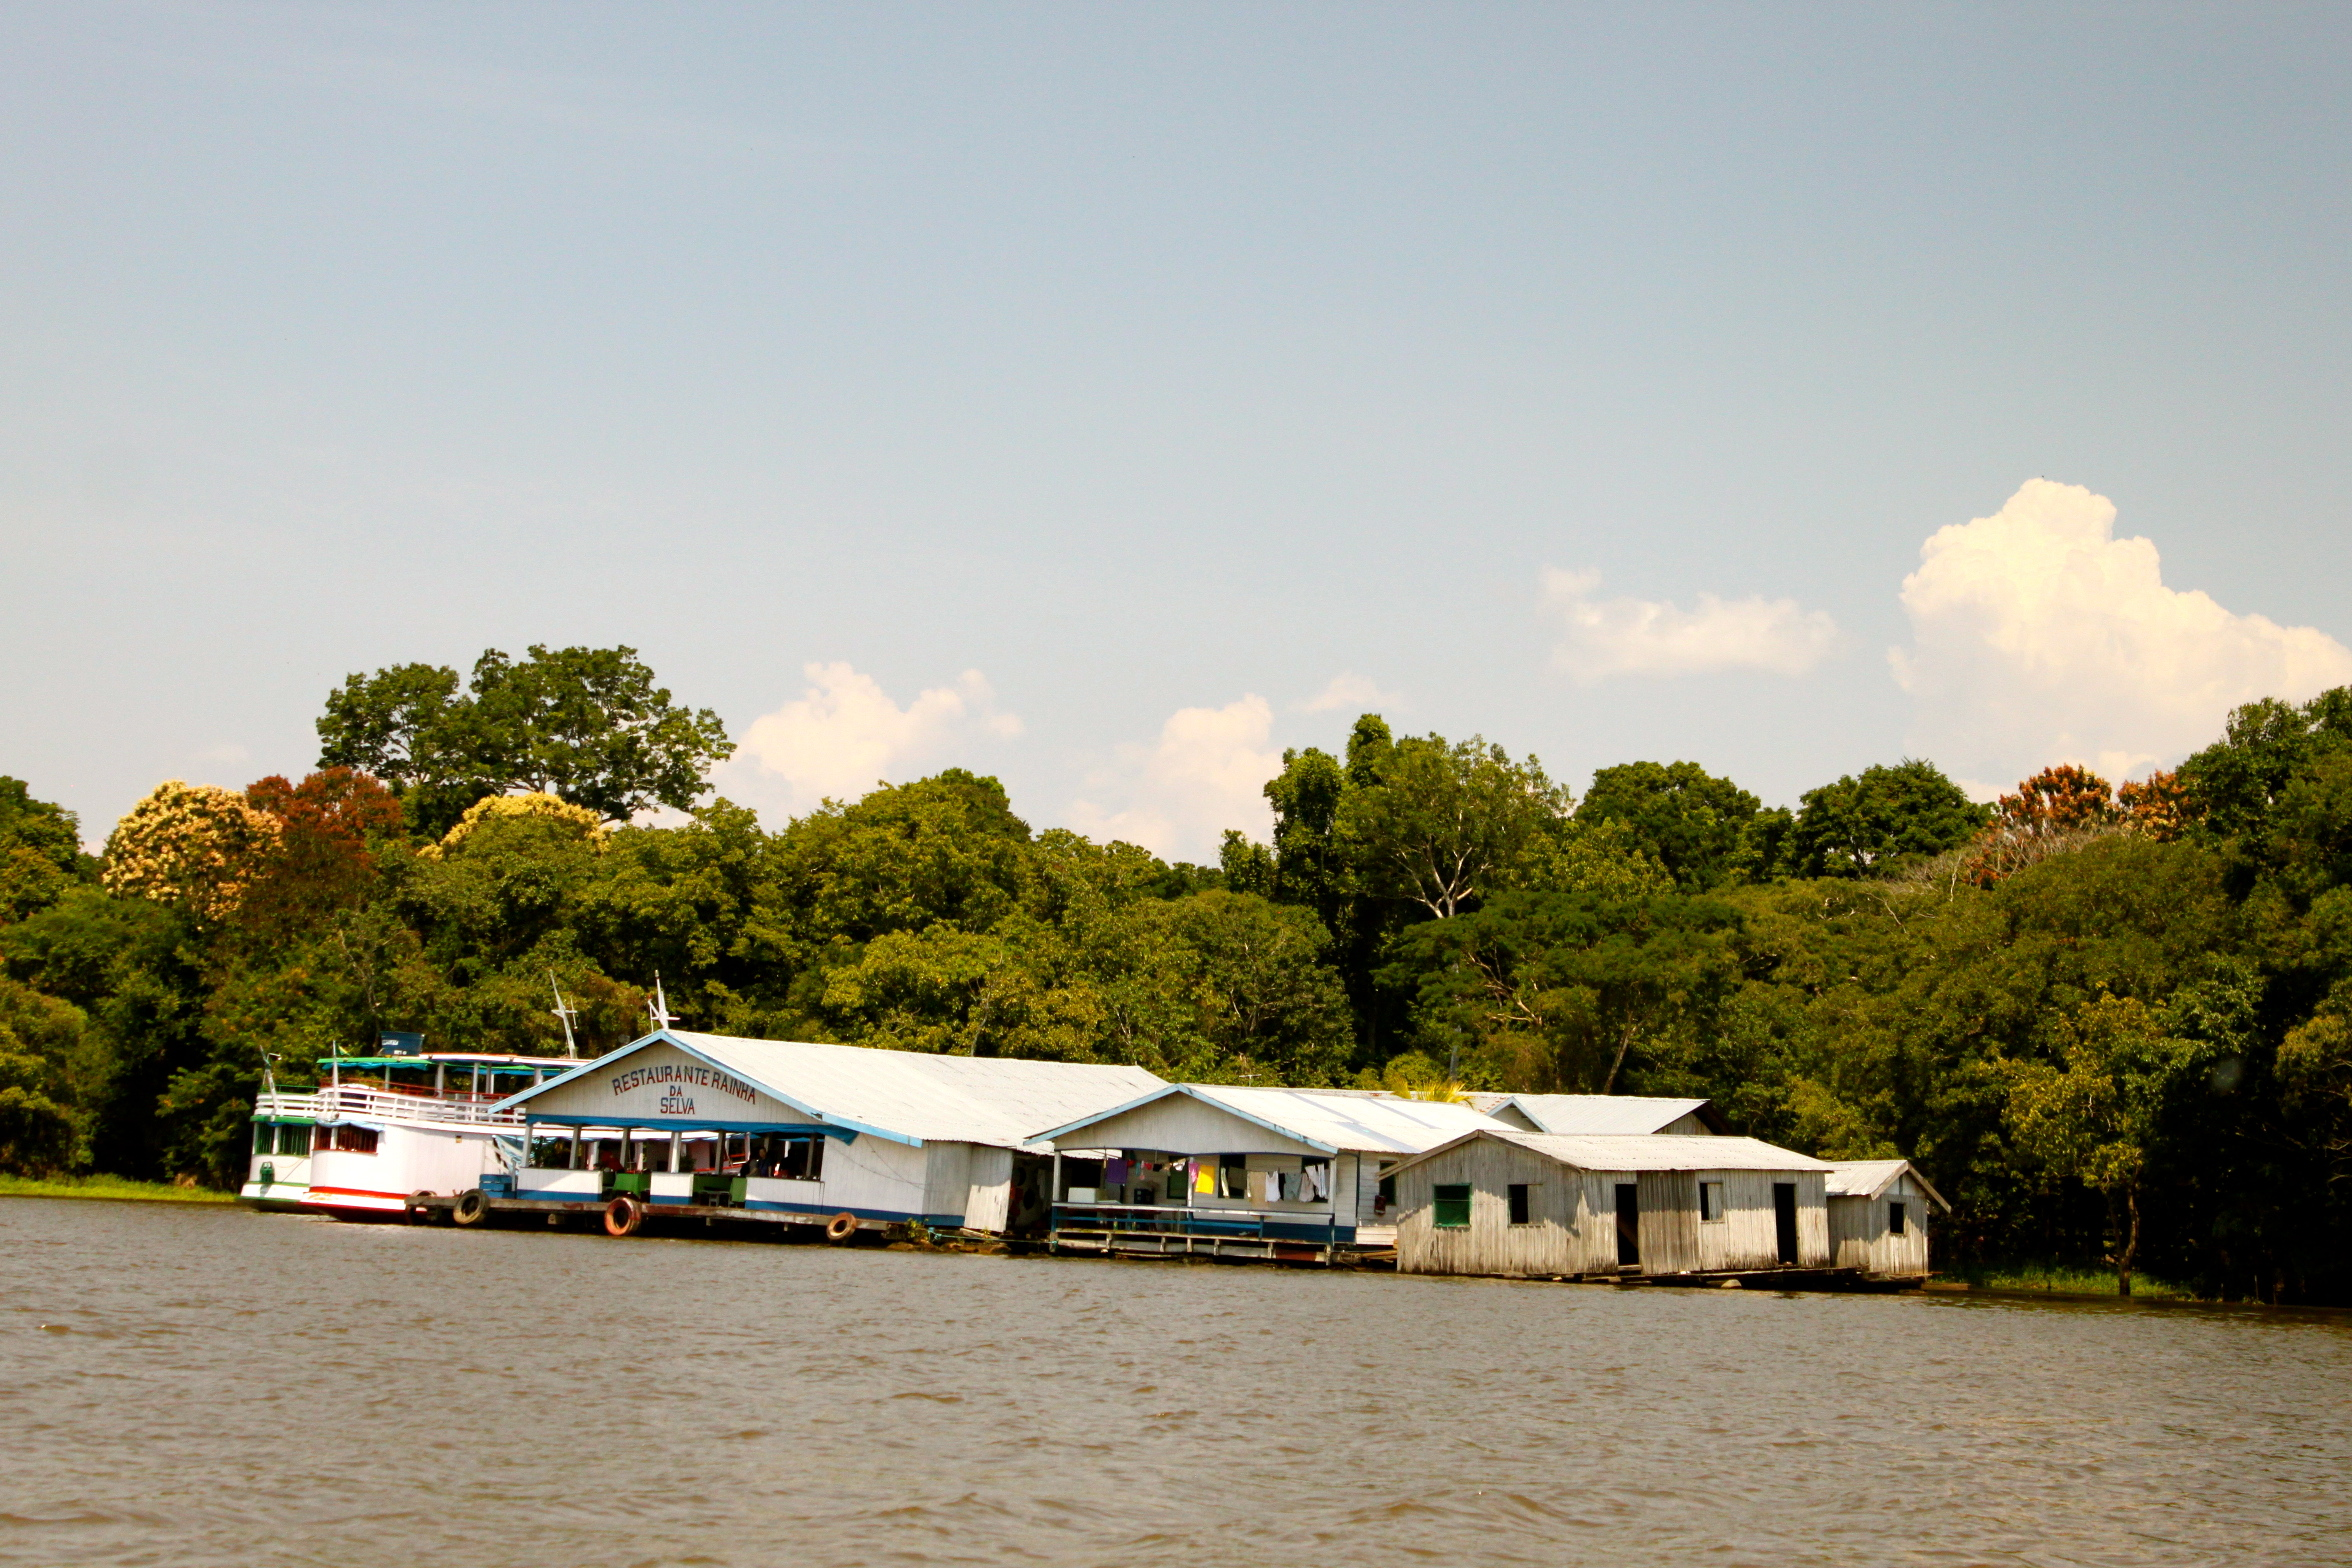 Floating houses of the Amazon